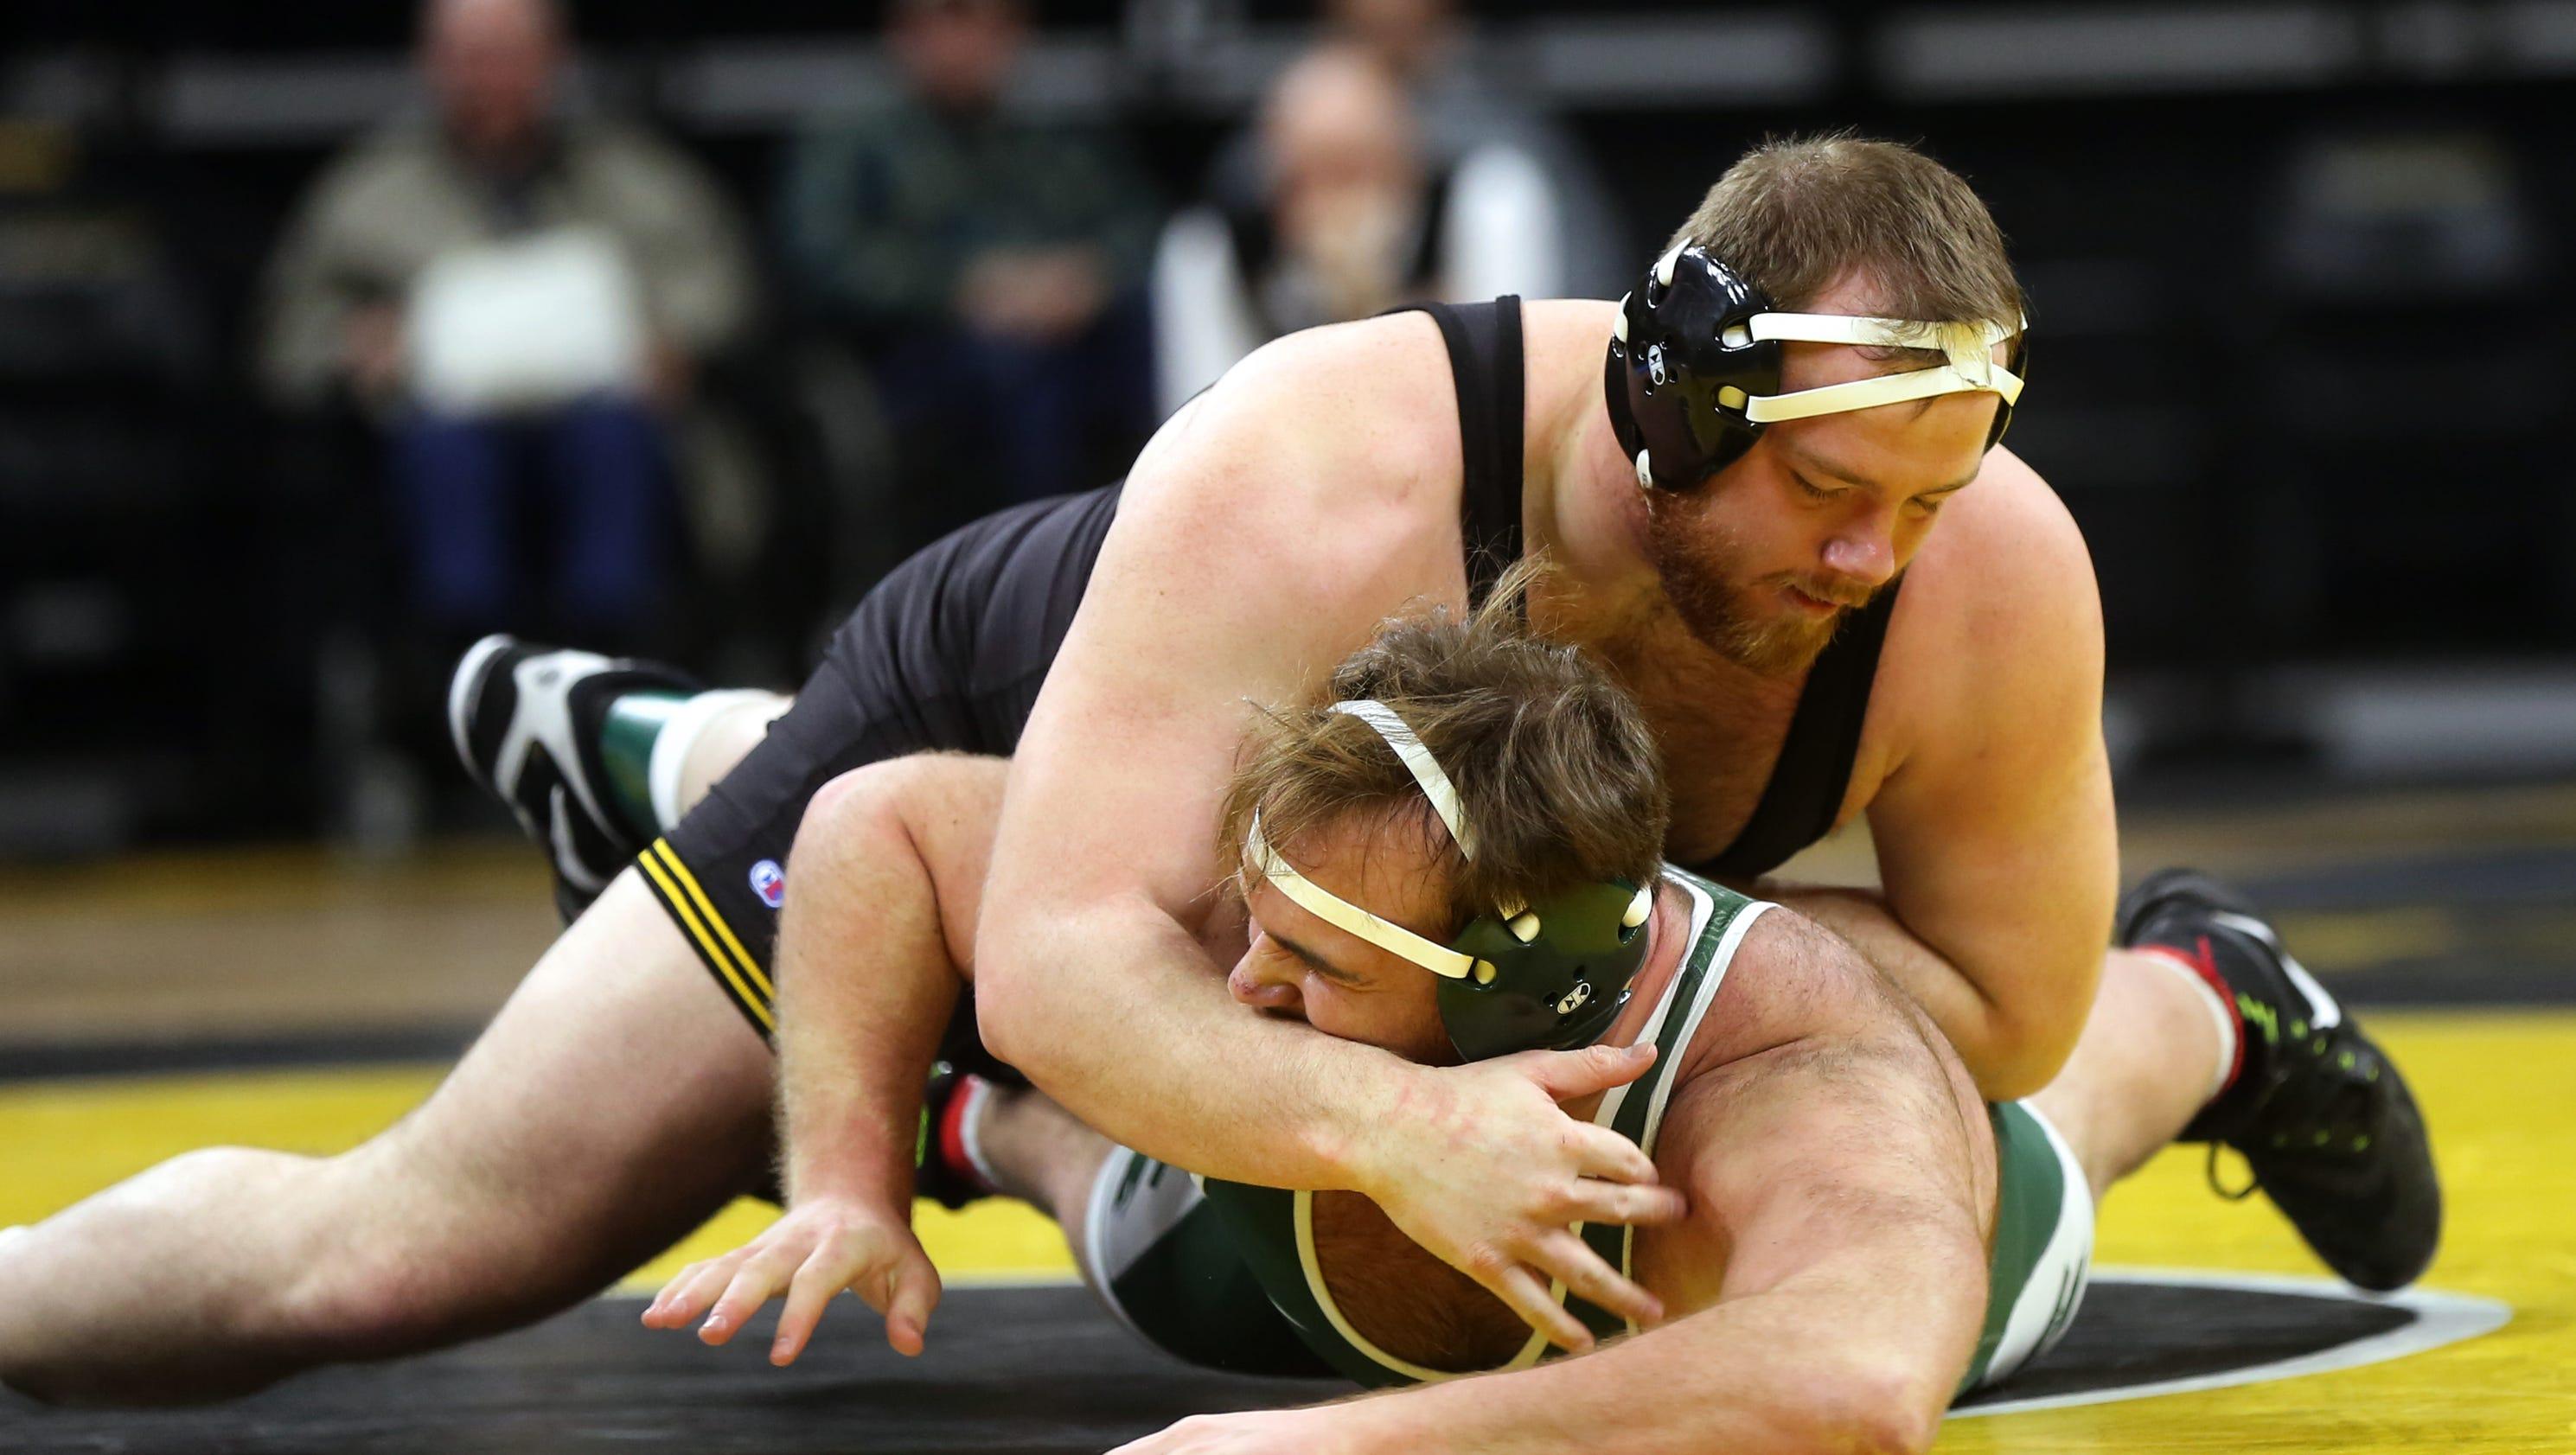 636507856107341288-180105-17-iowa-vs-michigan-state-wrestling-ds